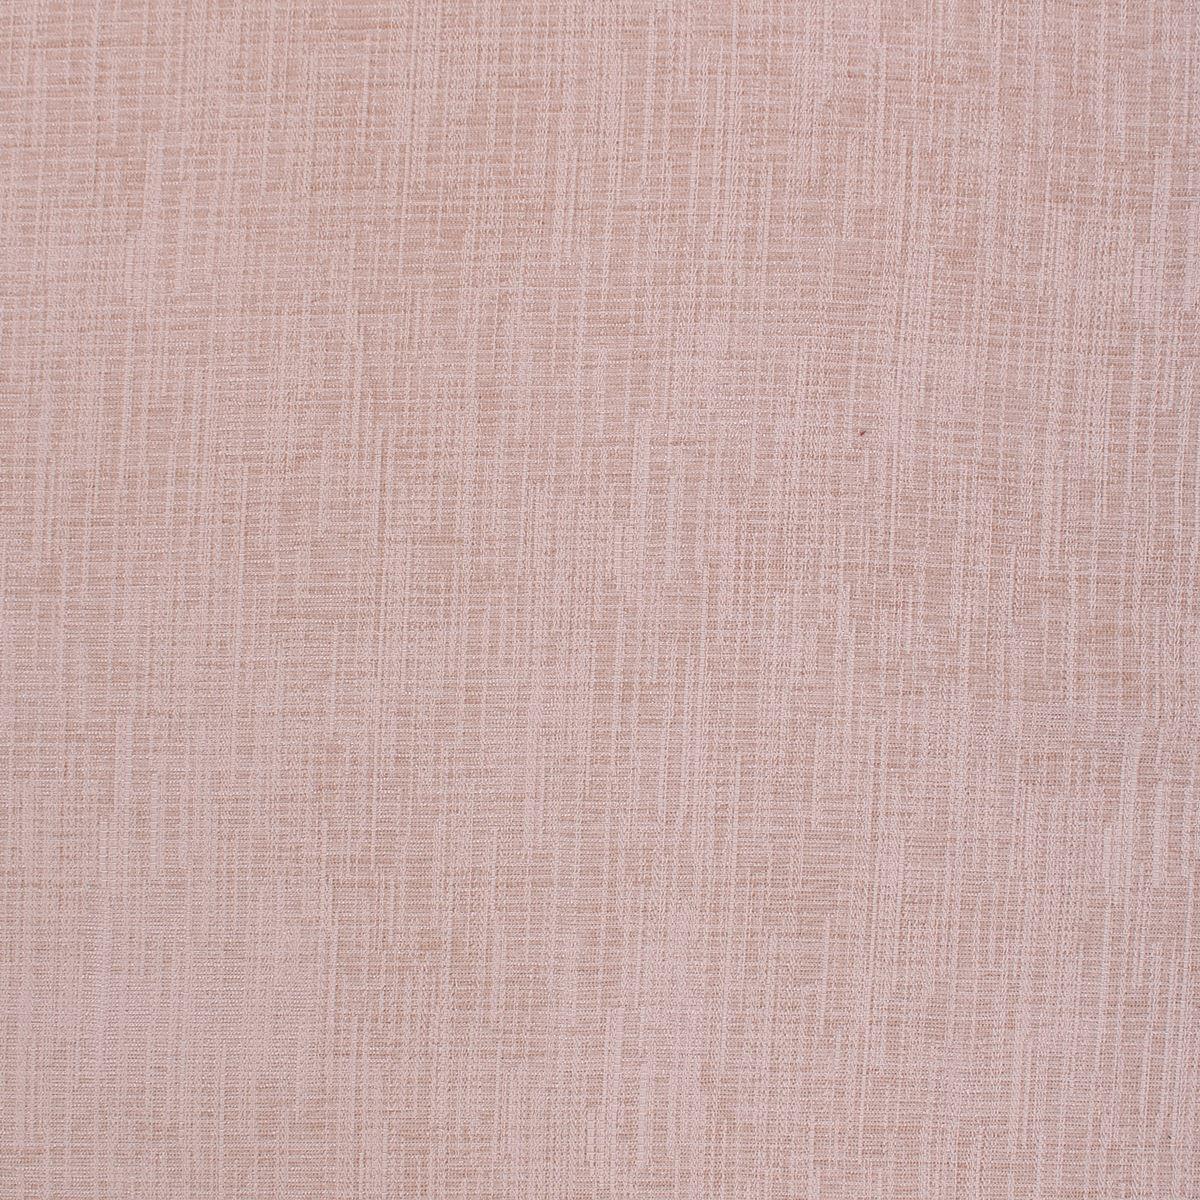 034-Chenille-034-Slubbed-Shabby-Worn-Look-Curtain-Cushion-Sofa-Upholstery-Fabric thumbnail 47